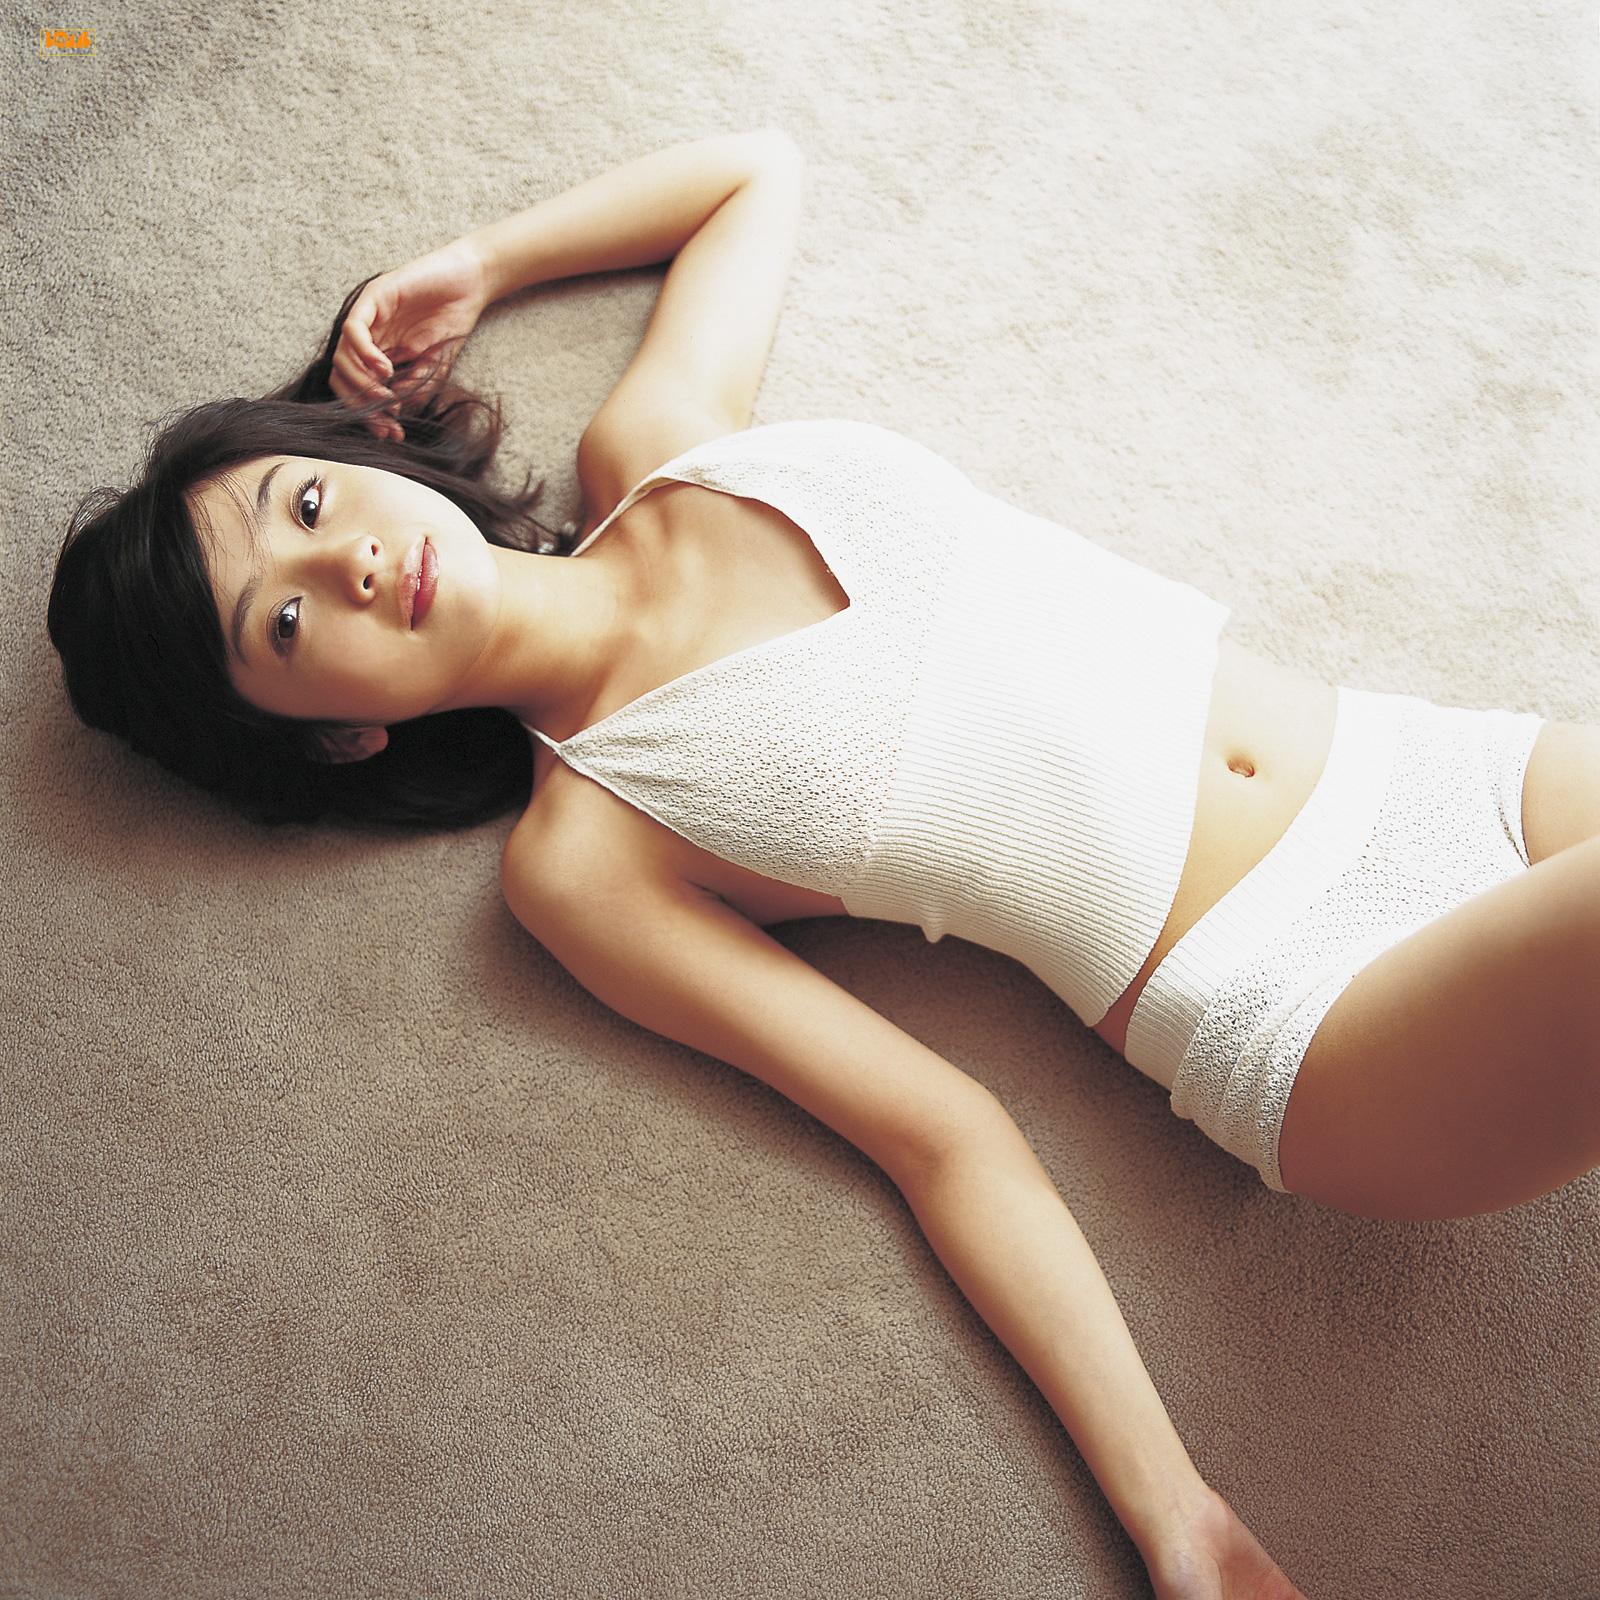 an019-jpg Nana Akiyama - Bomb.tv 秋山奈々 08110